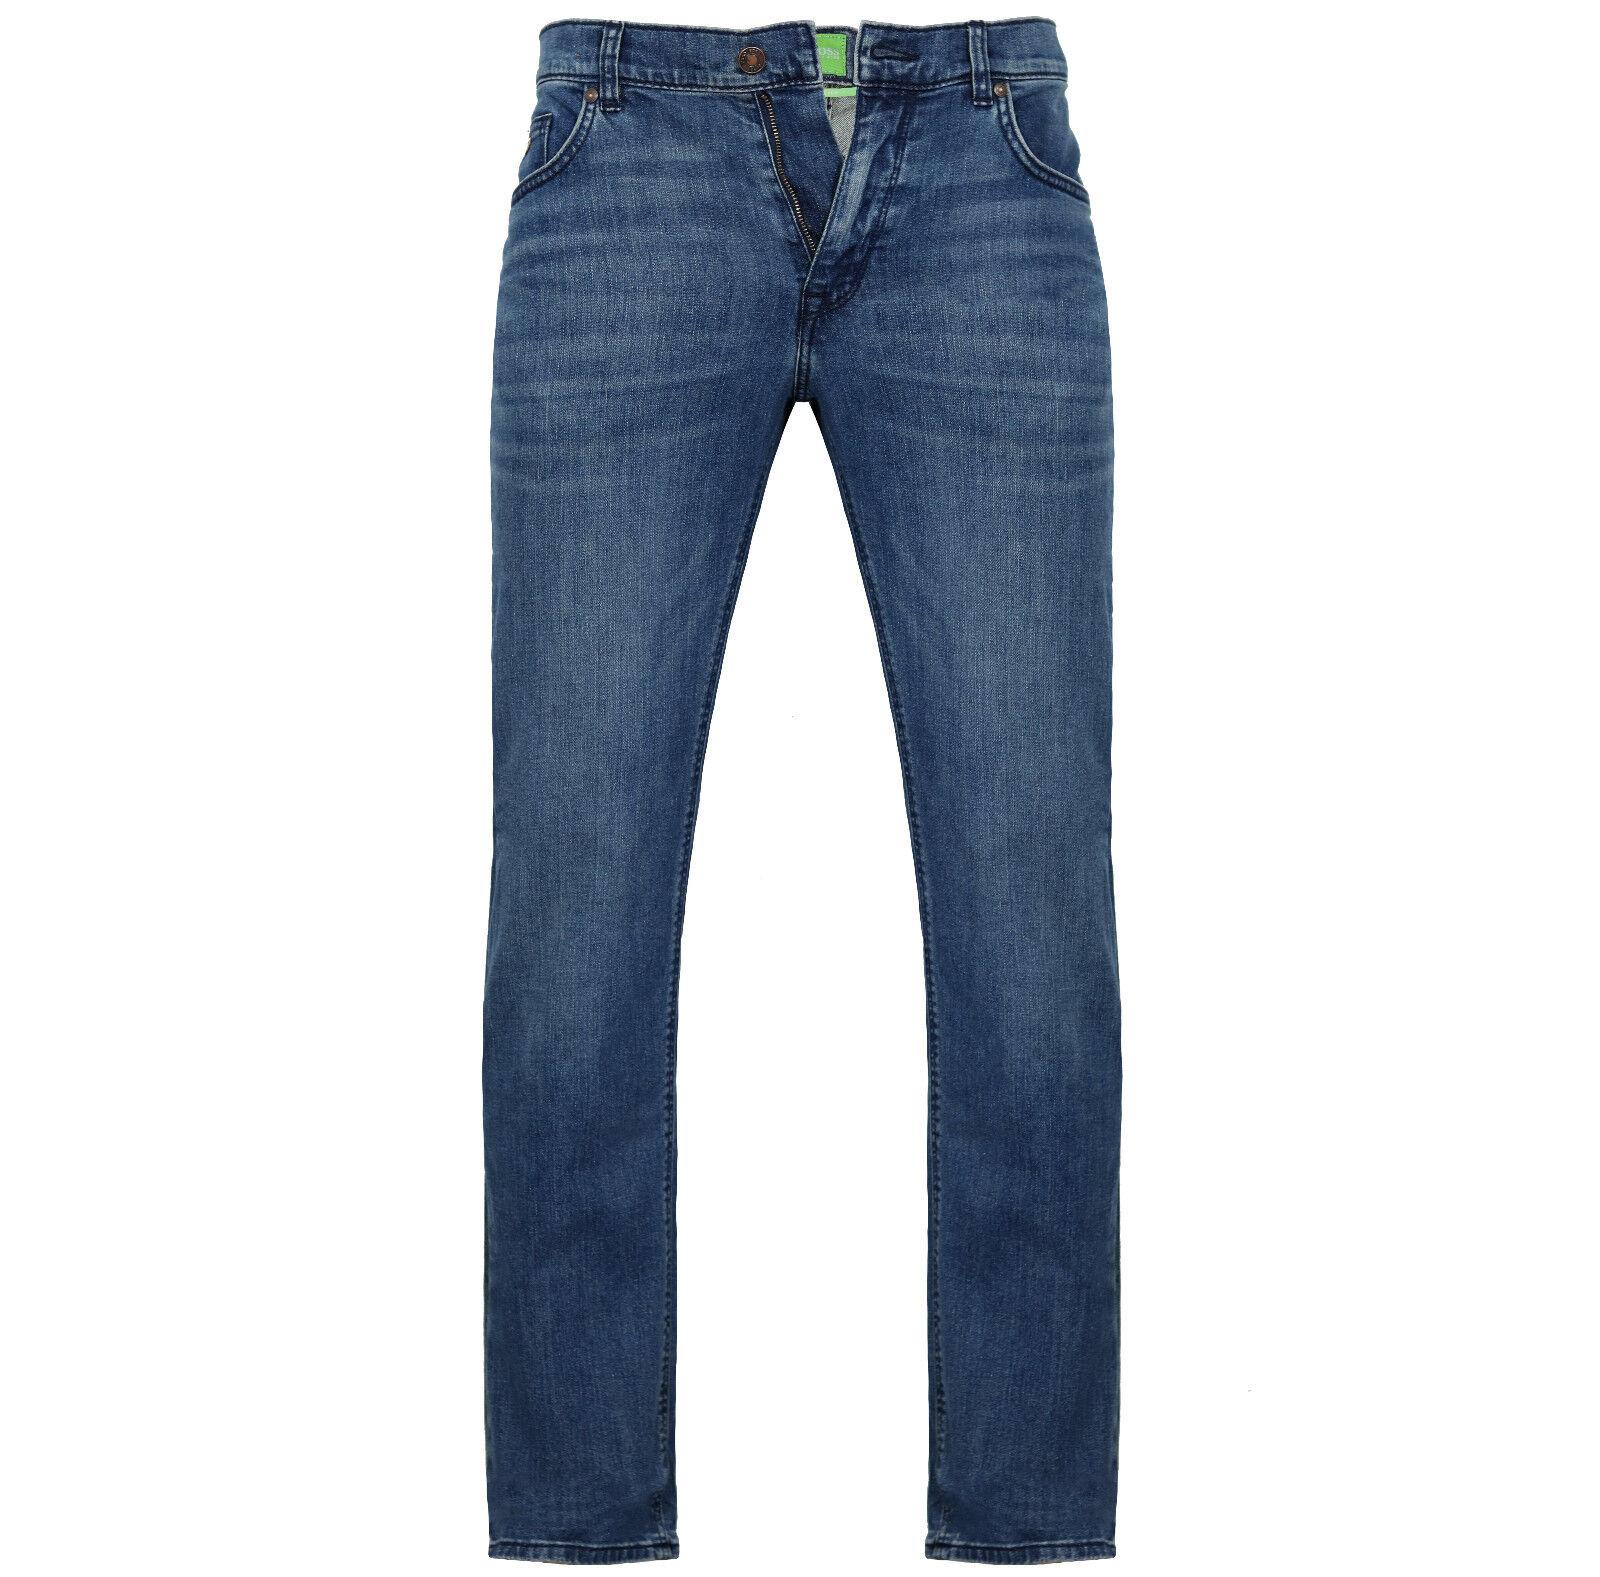 HUGO BOSS  Green Hose Jeans C-MAINE1  W32 L34  NEU  STRETCH